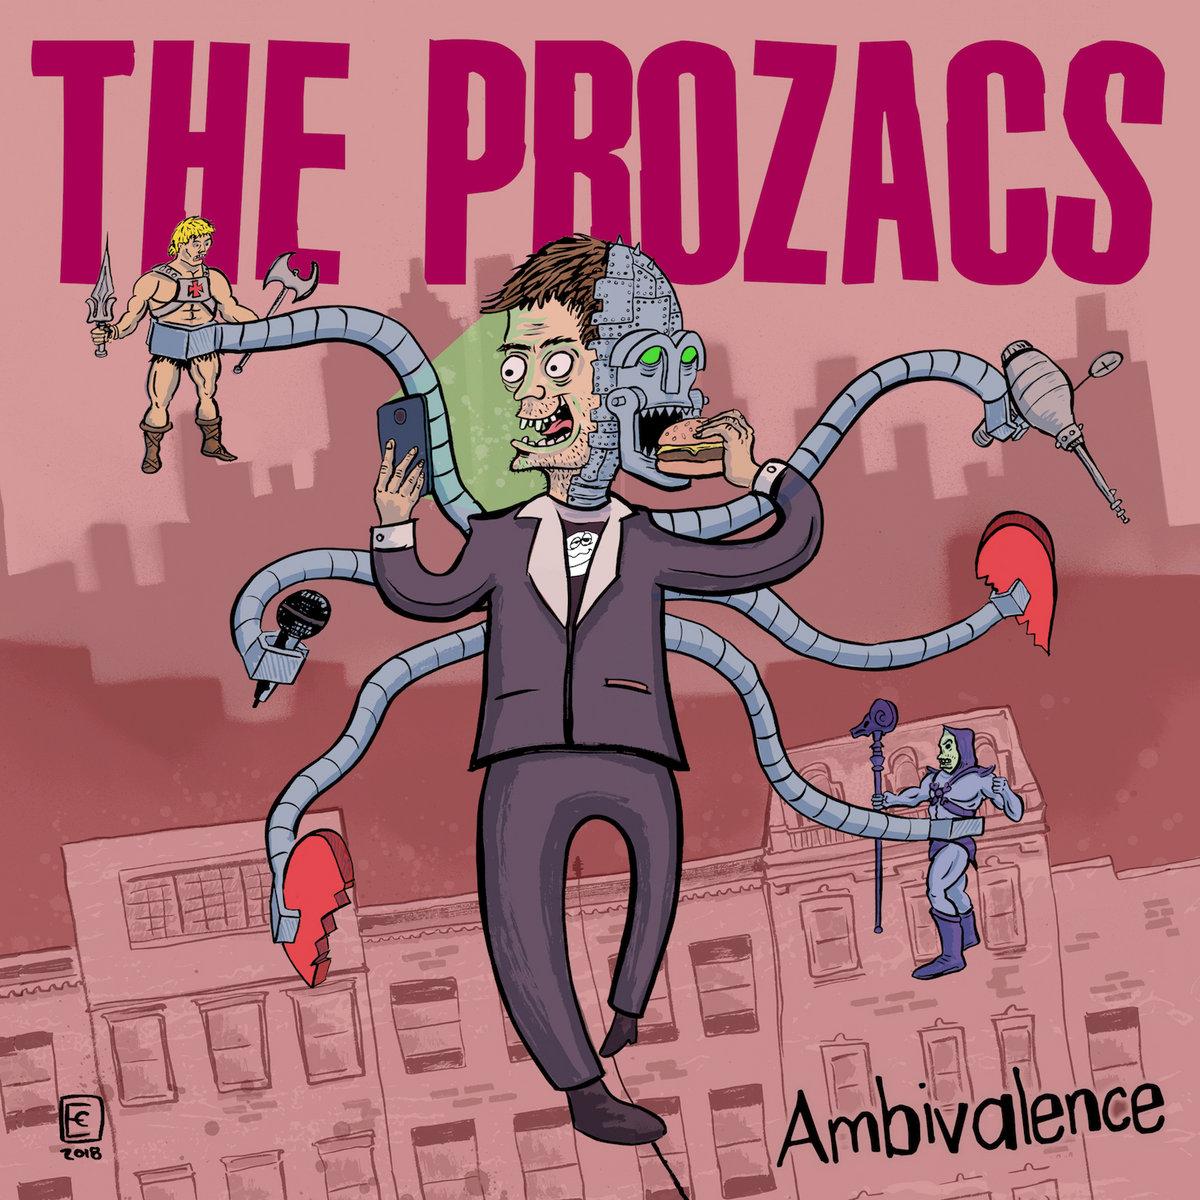 Ambivalence   The Prozacs